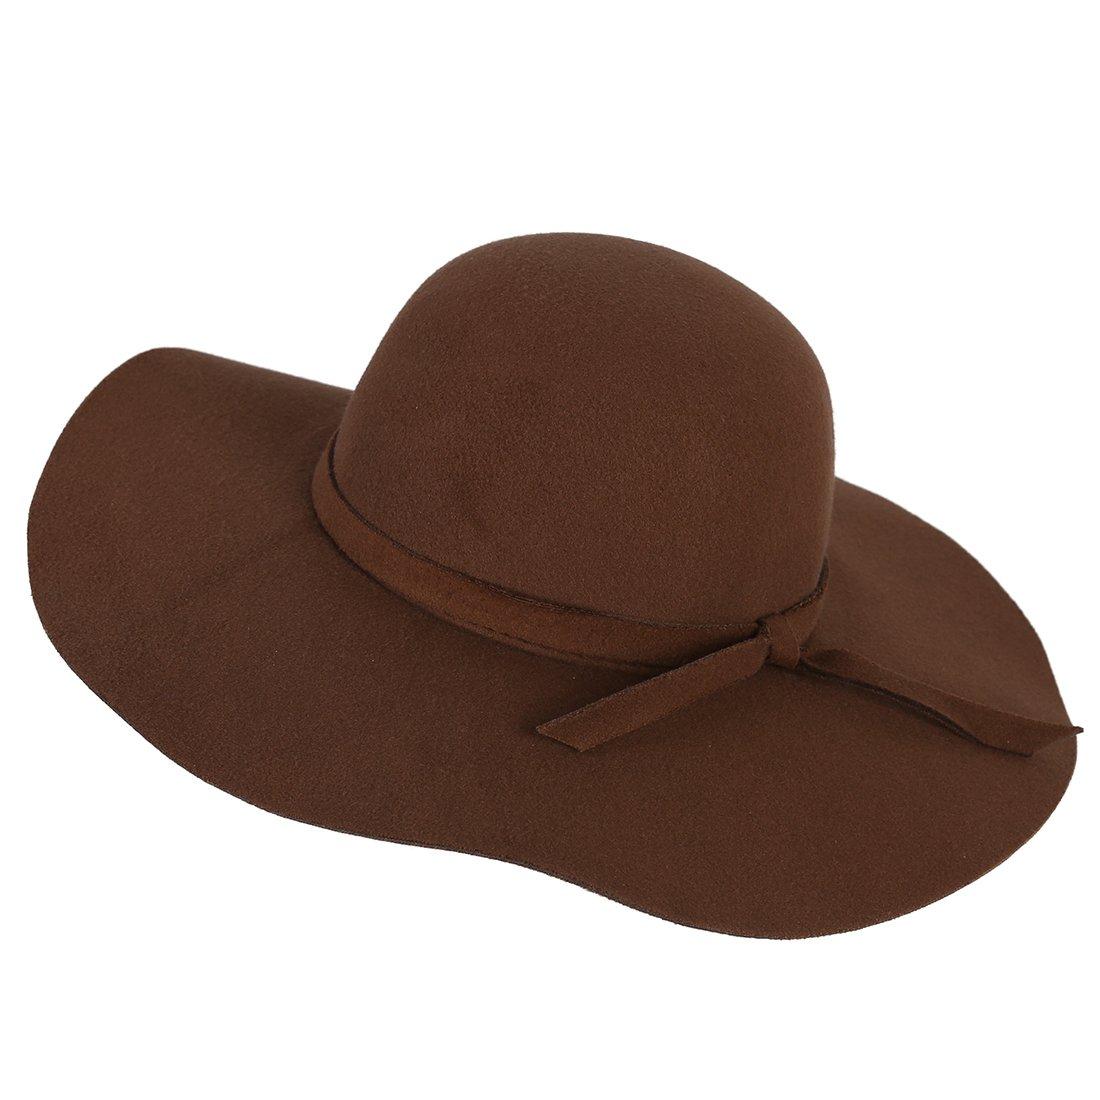 f127315a6328a4 SODIAL(R) Stylish Kids Girls Wide Brim Retro Felt Bowler Floppy Cap Cloche  Hat-Brown: Amazon.co.uk: Clothing